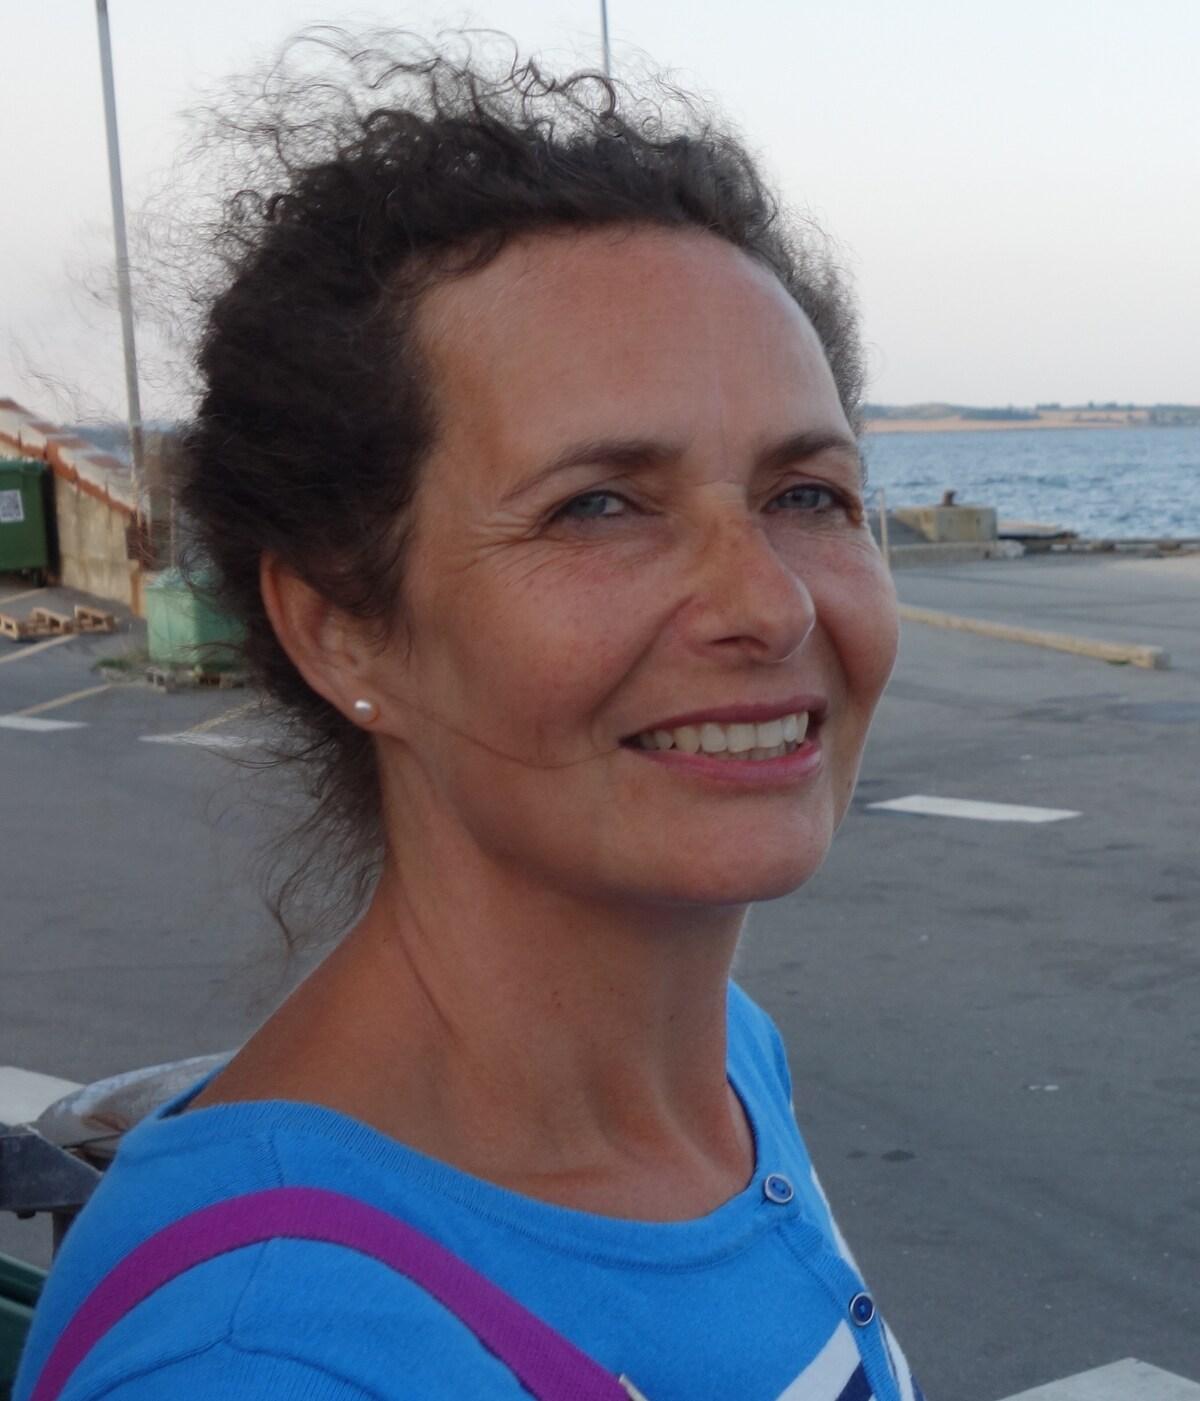 Ruth from Nyborg